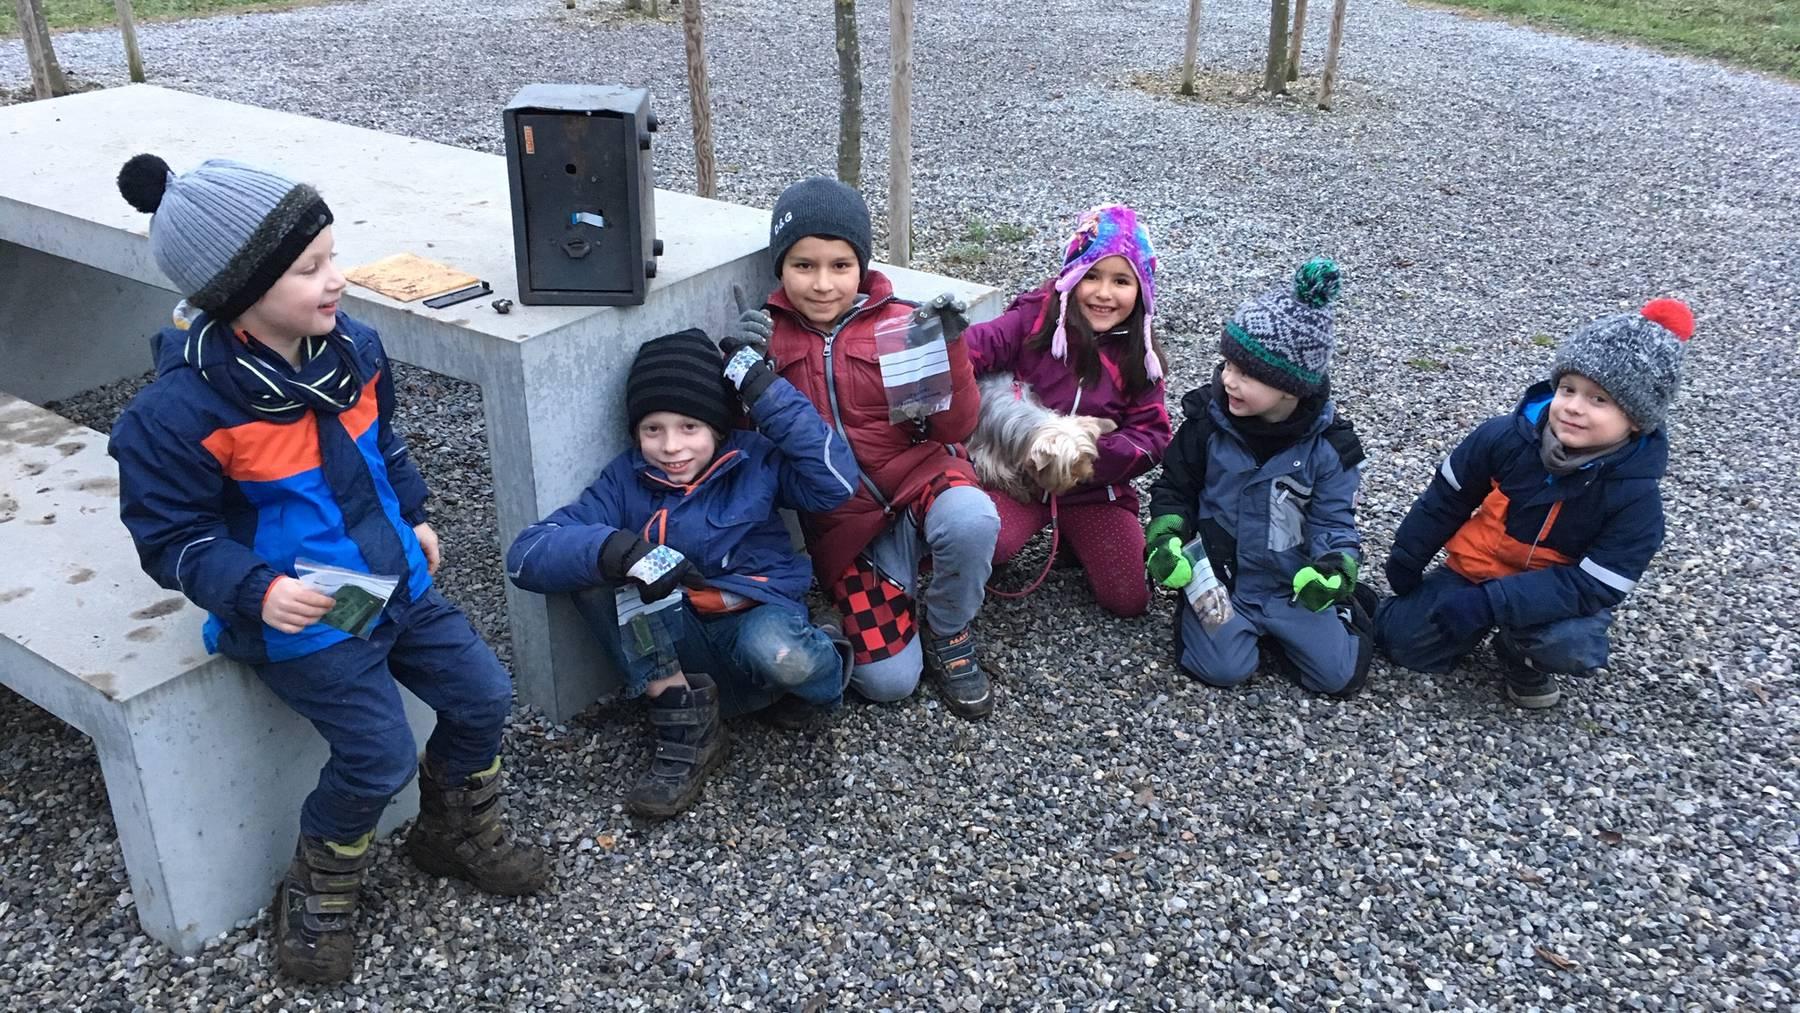 Kinder in Baar finden einen gestohlenen Tresor